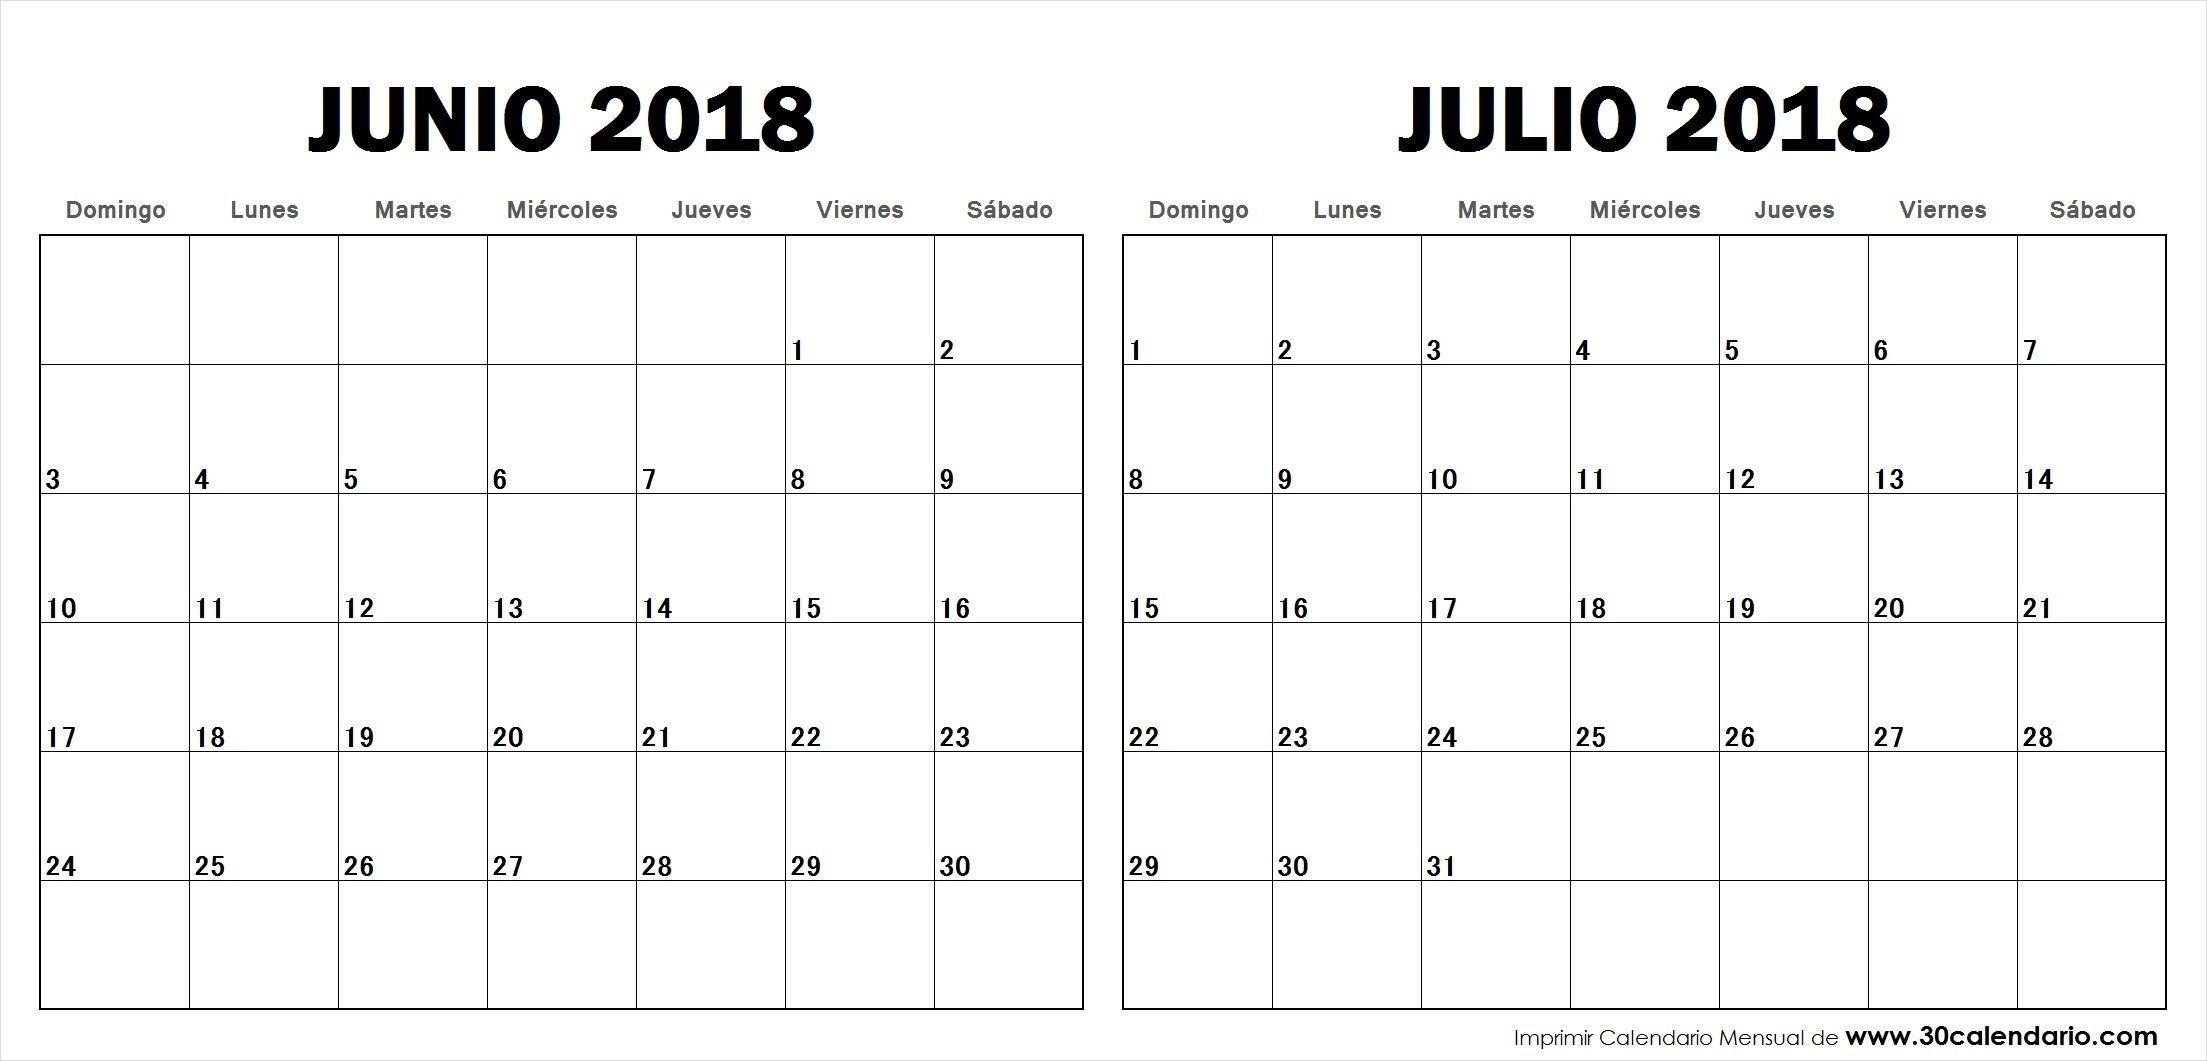 Calendario 2019 Feriados En Chile Más Actual Calendario Mayo 2019 53ld Calendarioplanificador Imprimible Of Calendario 2019 Feriados En Chile Más Arriba-a-fecha Calendario 2016 Para Imprimir Puerto Rico Calendar